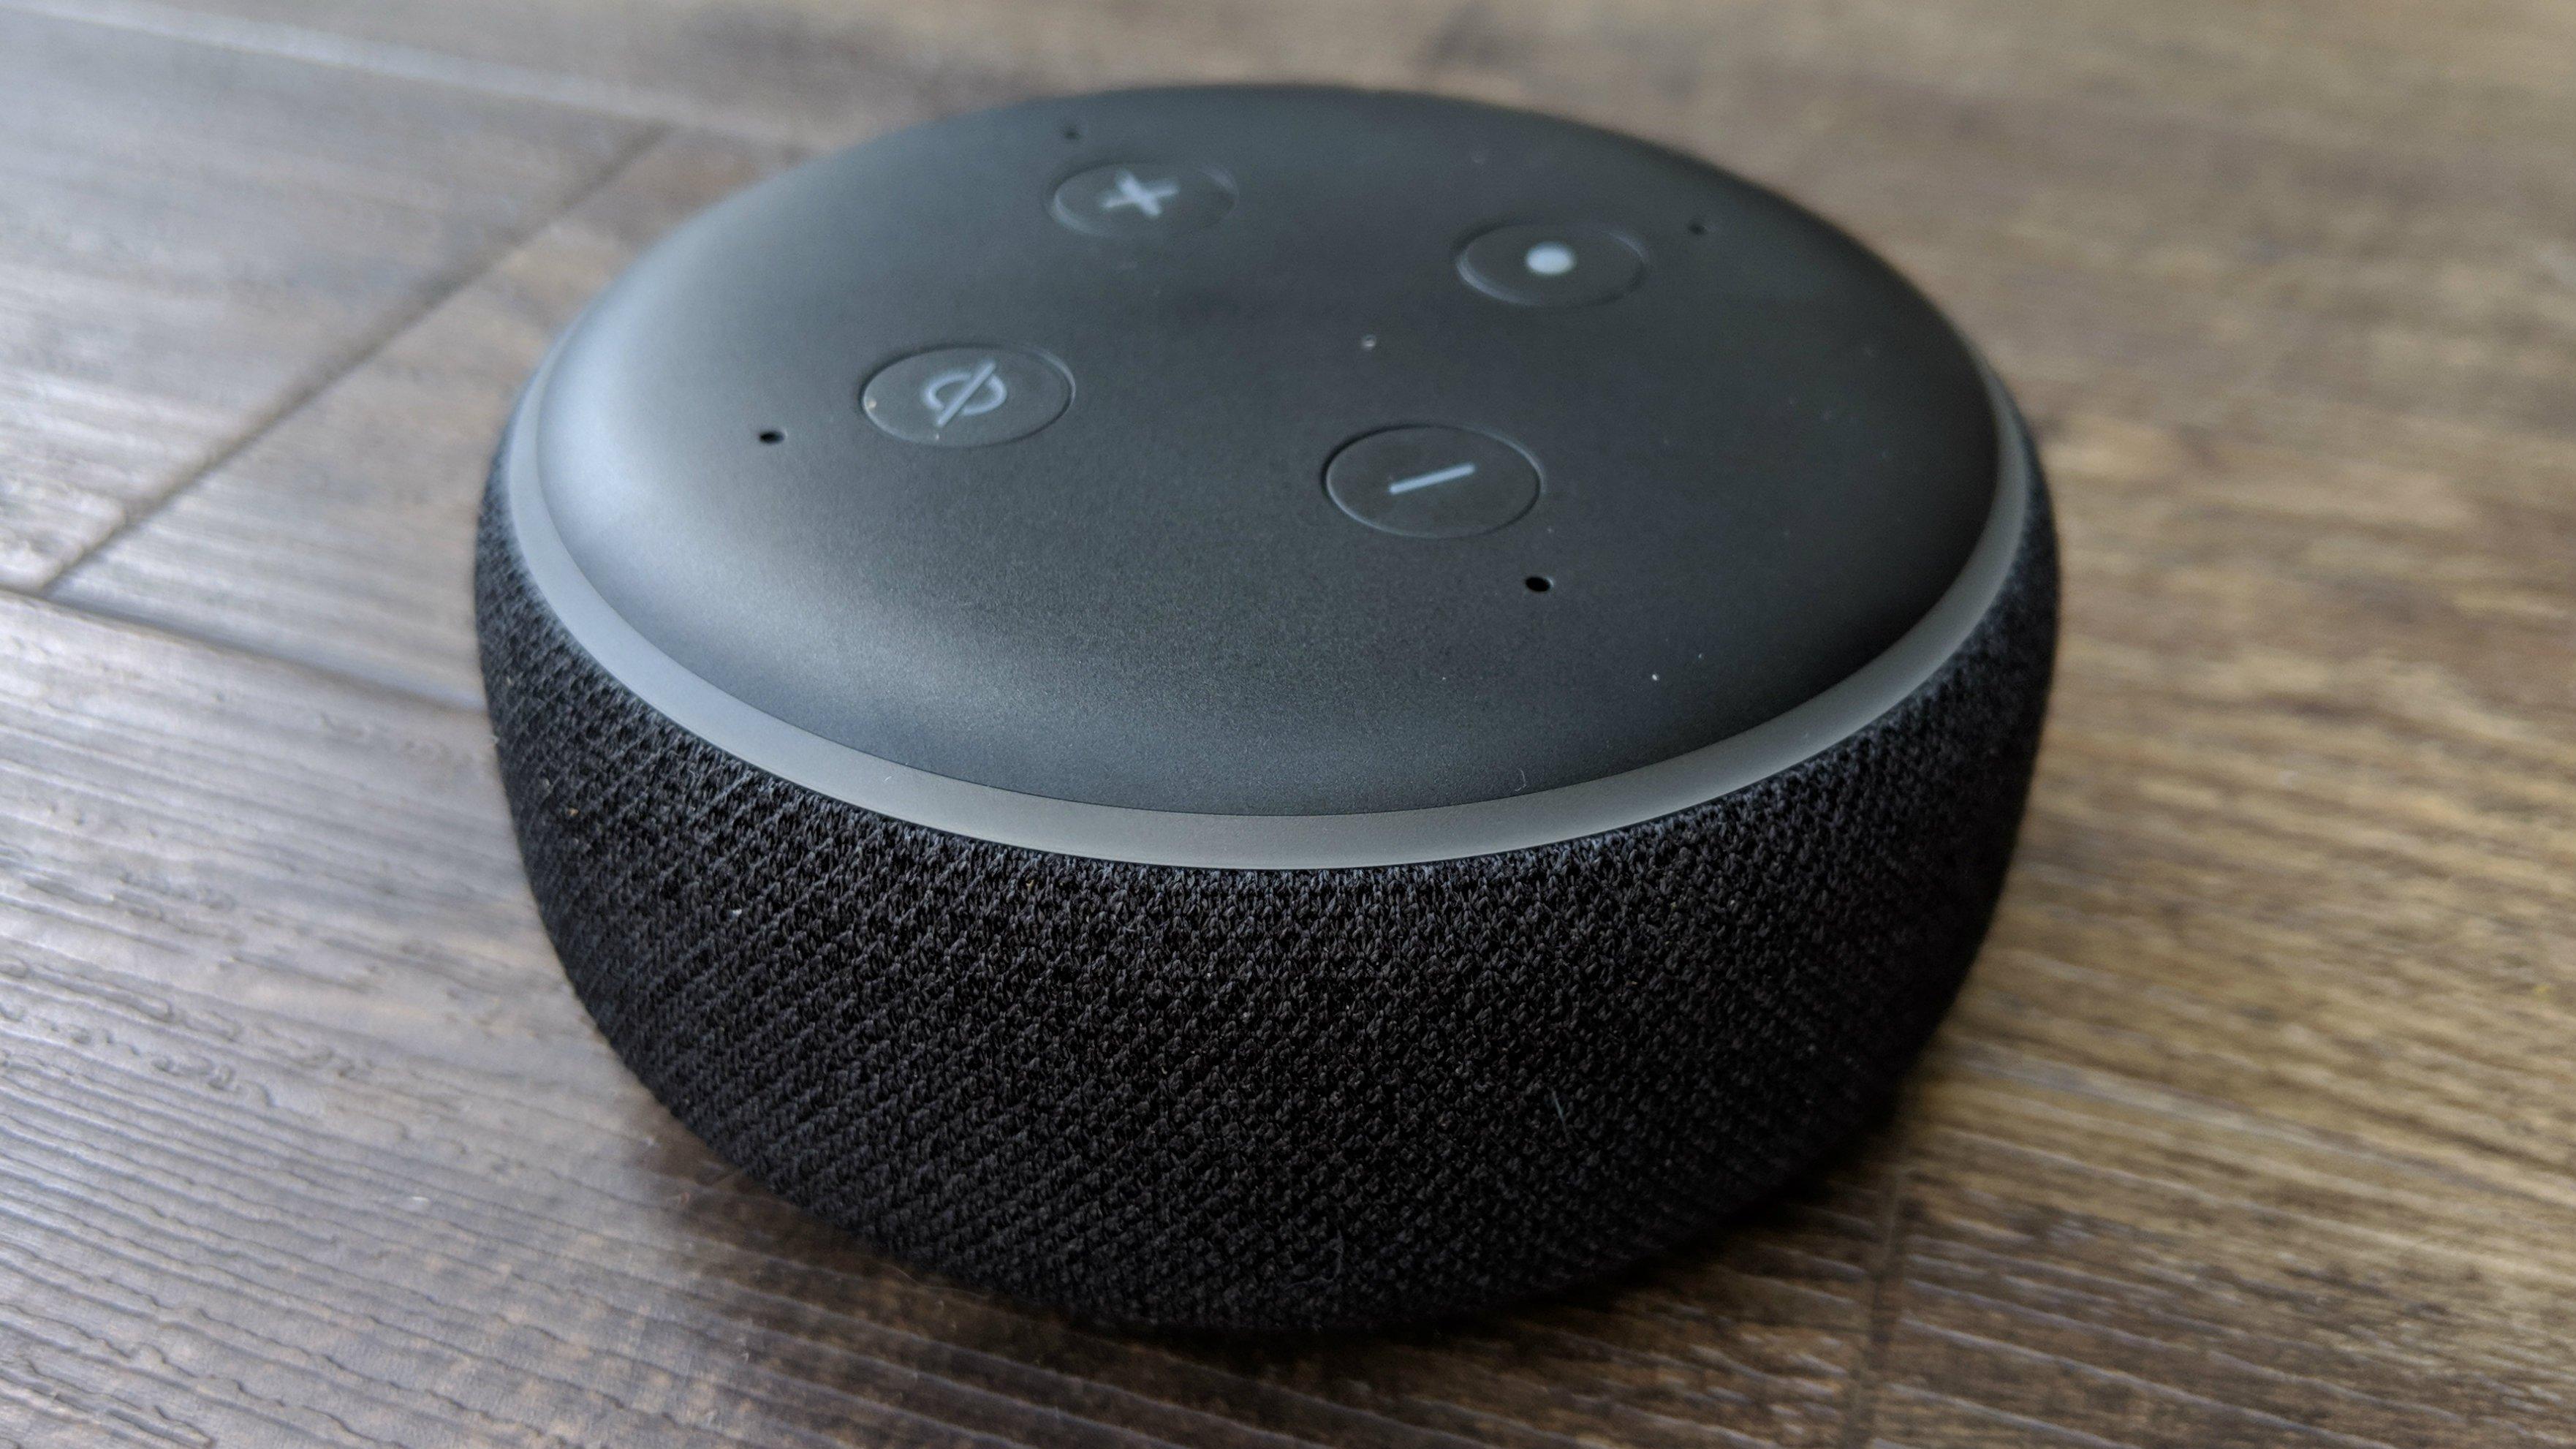 amazon echo dot speaker crackling